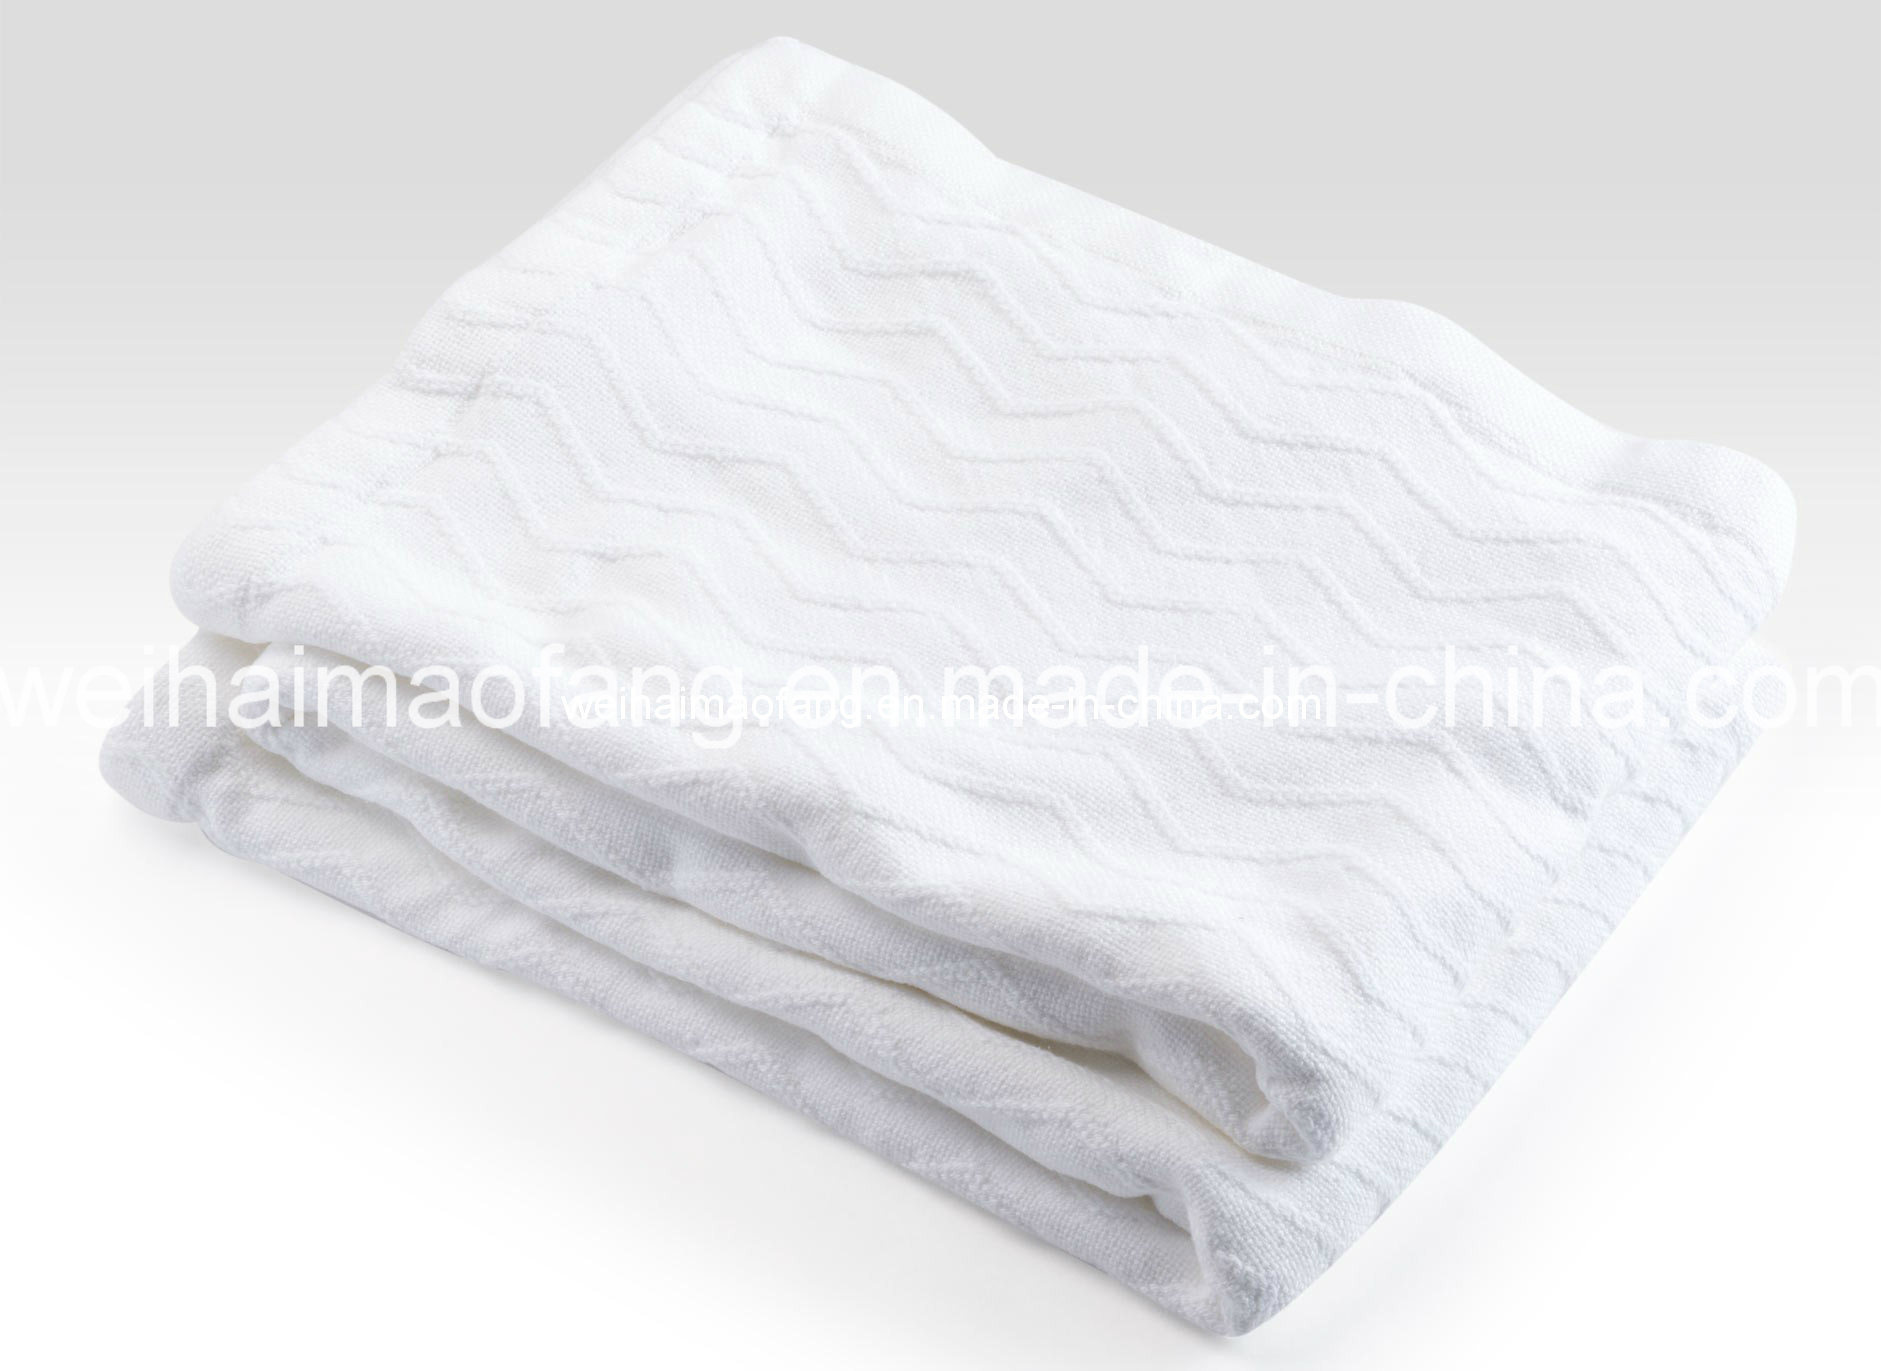 Woven Jacquard Weave 100% Pure Cotton Blanket